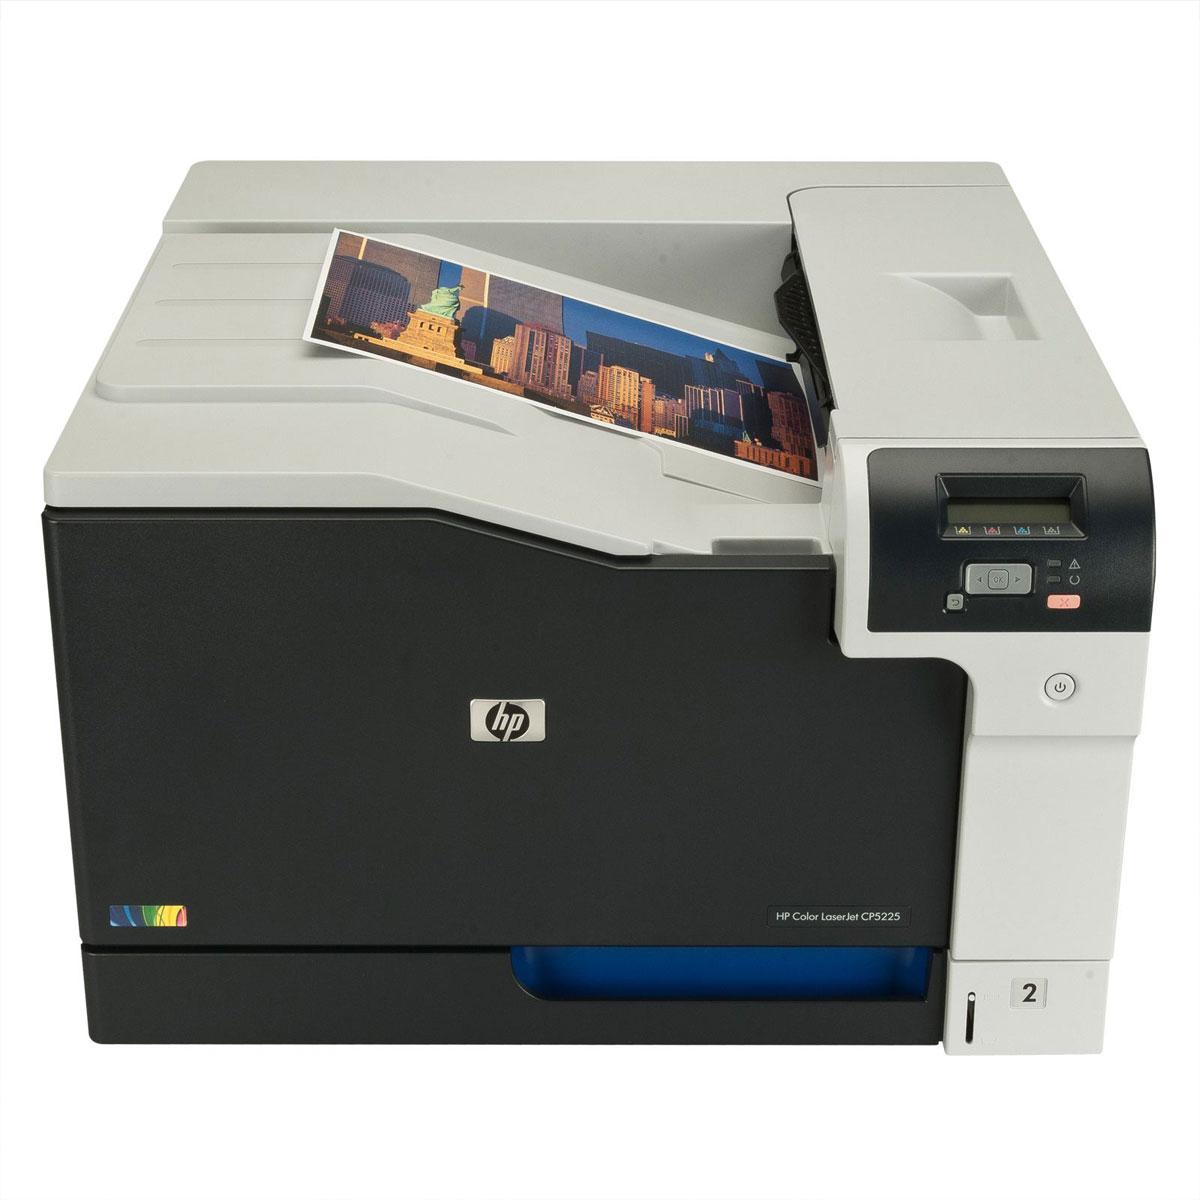 hp color laserjet professional cp5225 ce710a b19 achat vente imprimante laser sur. Black Bedroom Furniture Sets. Home Design Ideas